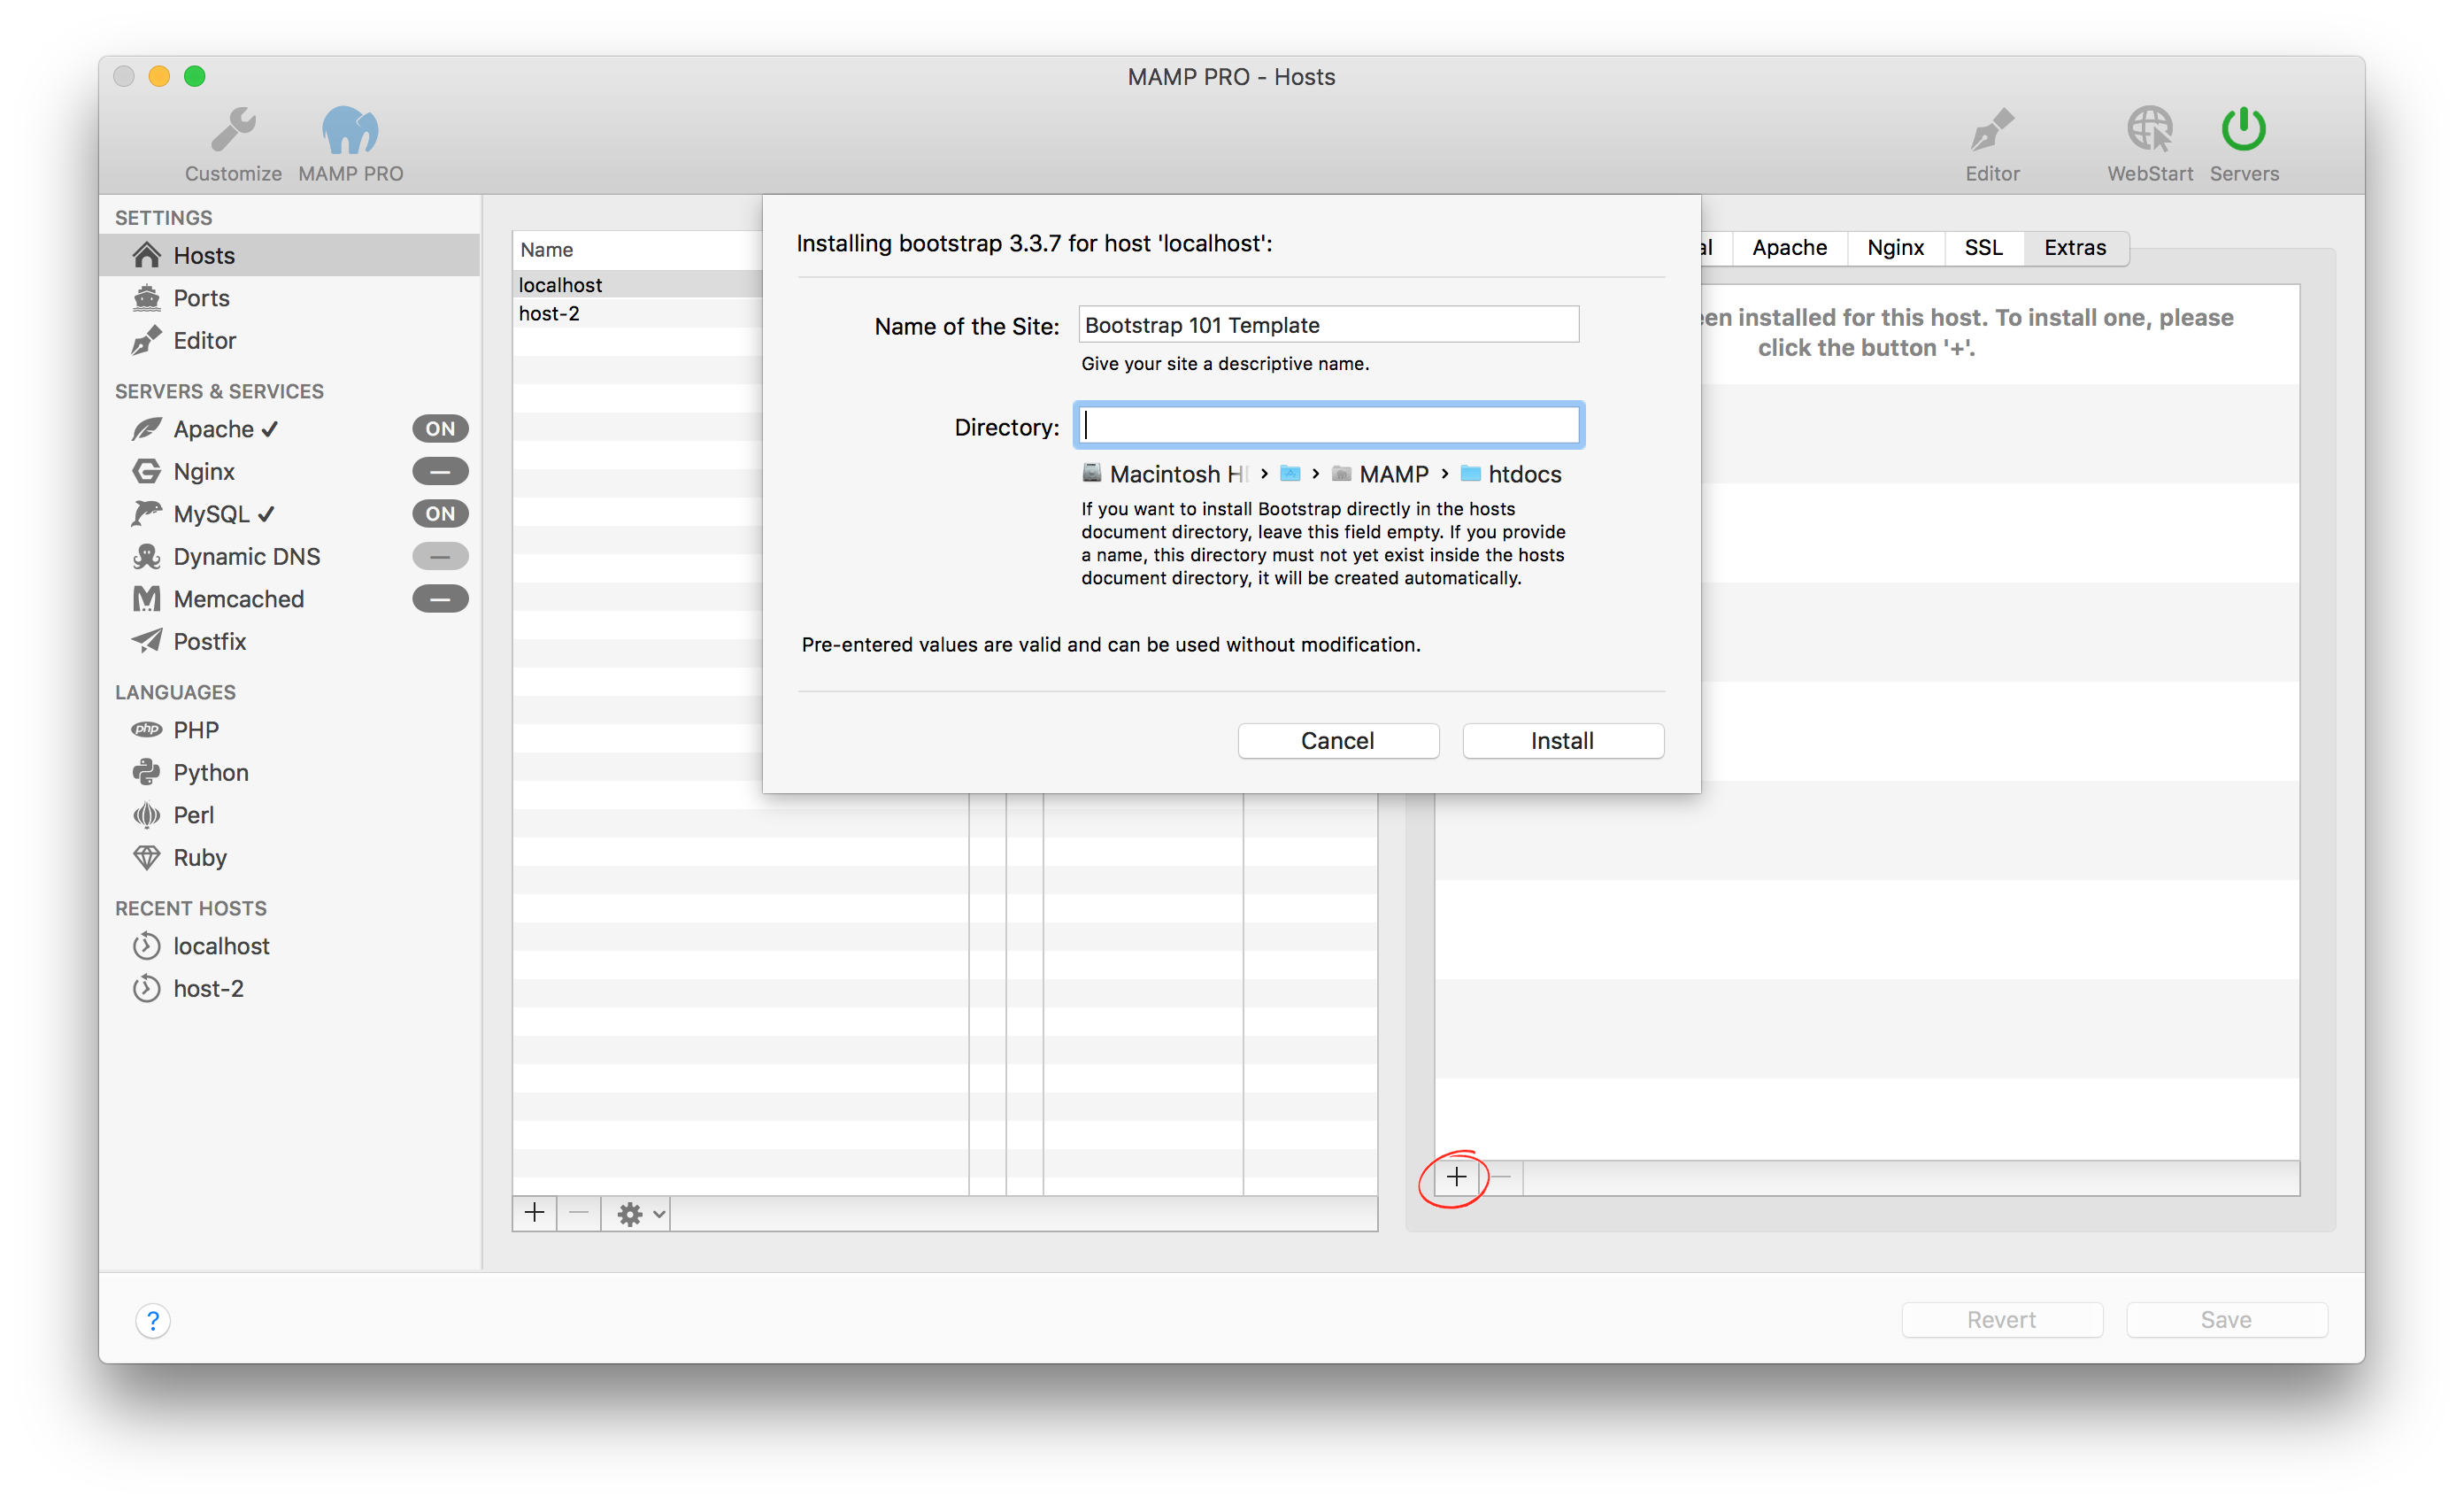 MAMP PRO (Windows) Documentation > Settings > Hosts > Extras > Bootstrap